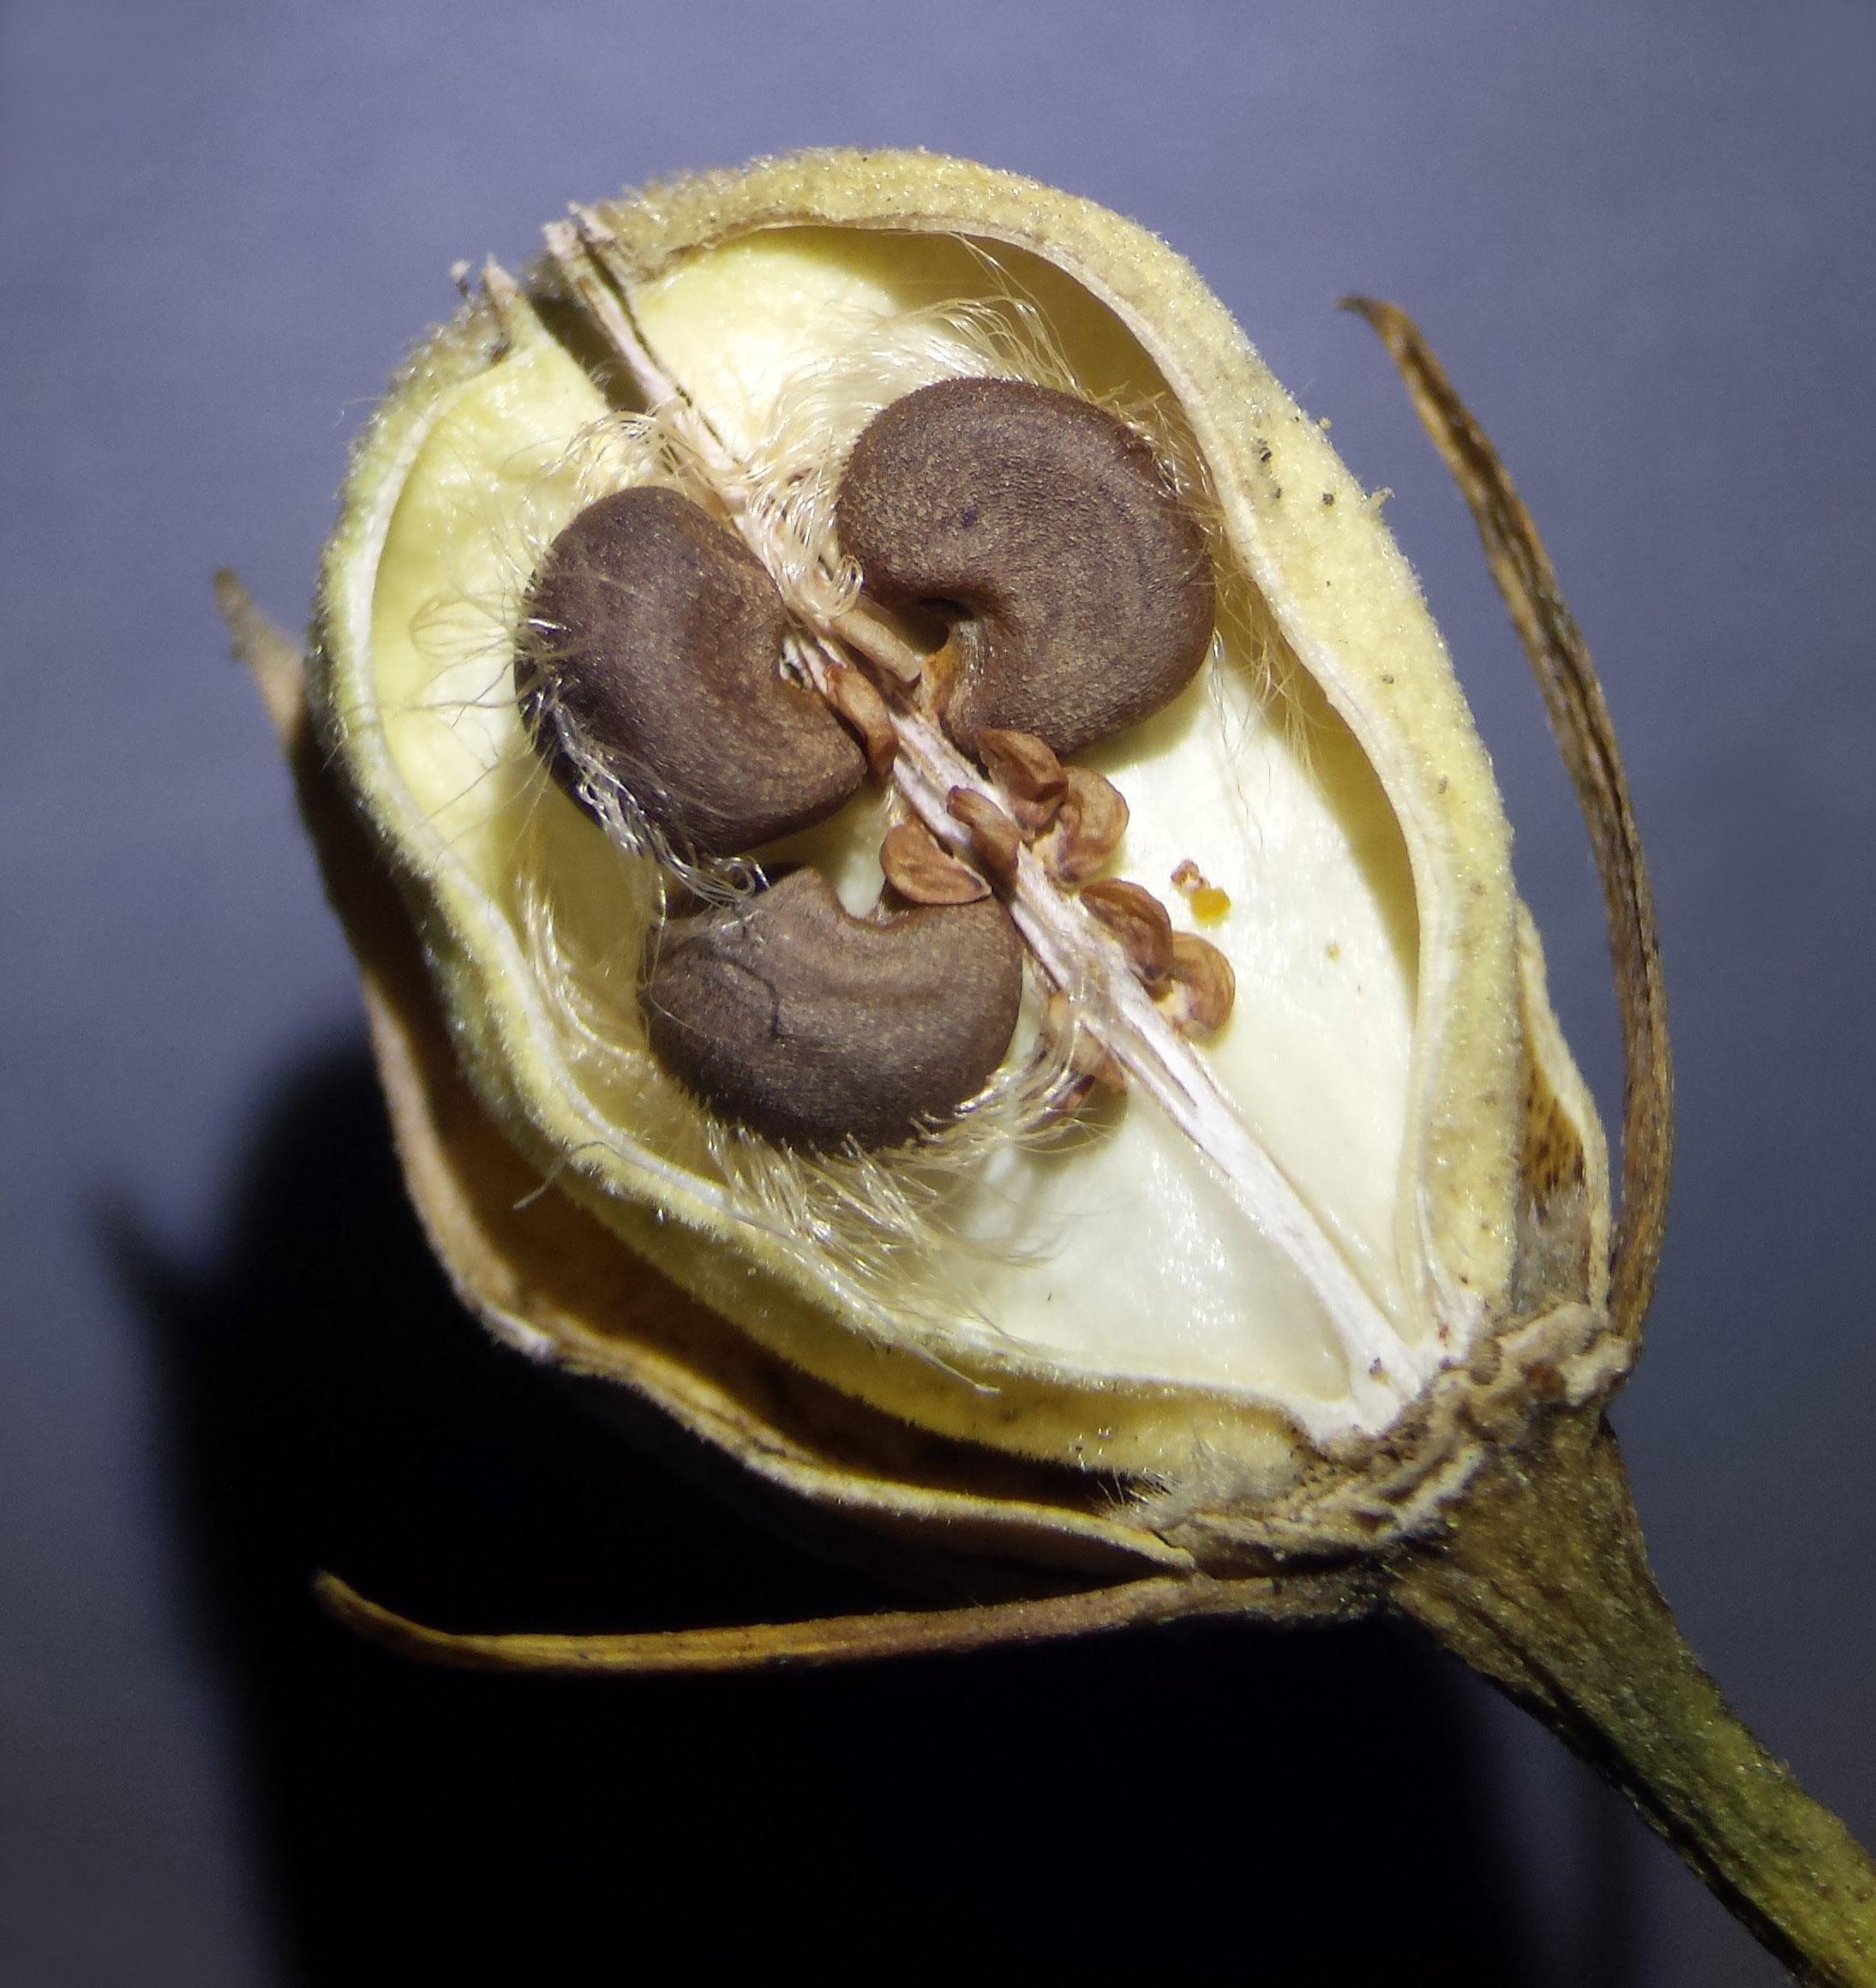 Half-cut-Rose-of-Sharon-fruit-showing-seeds